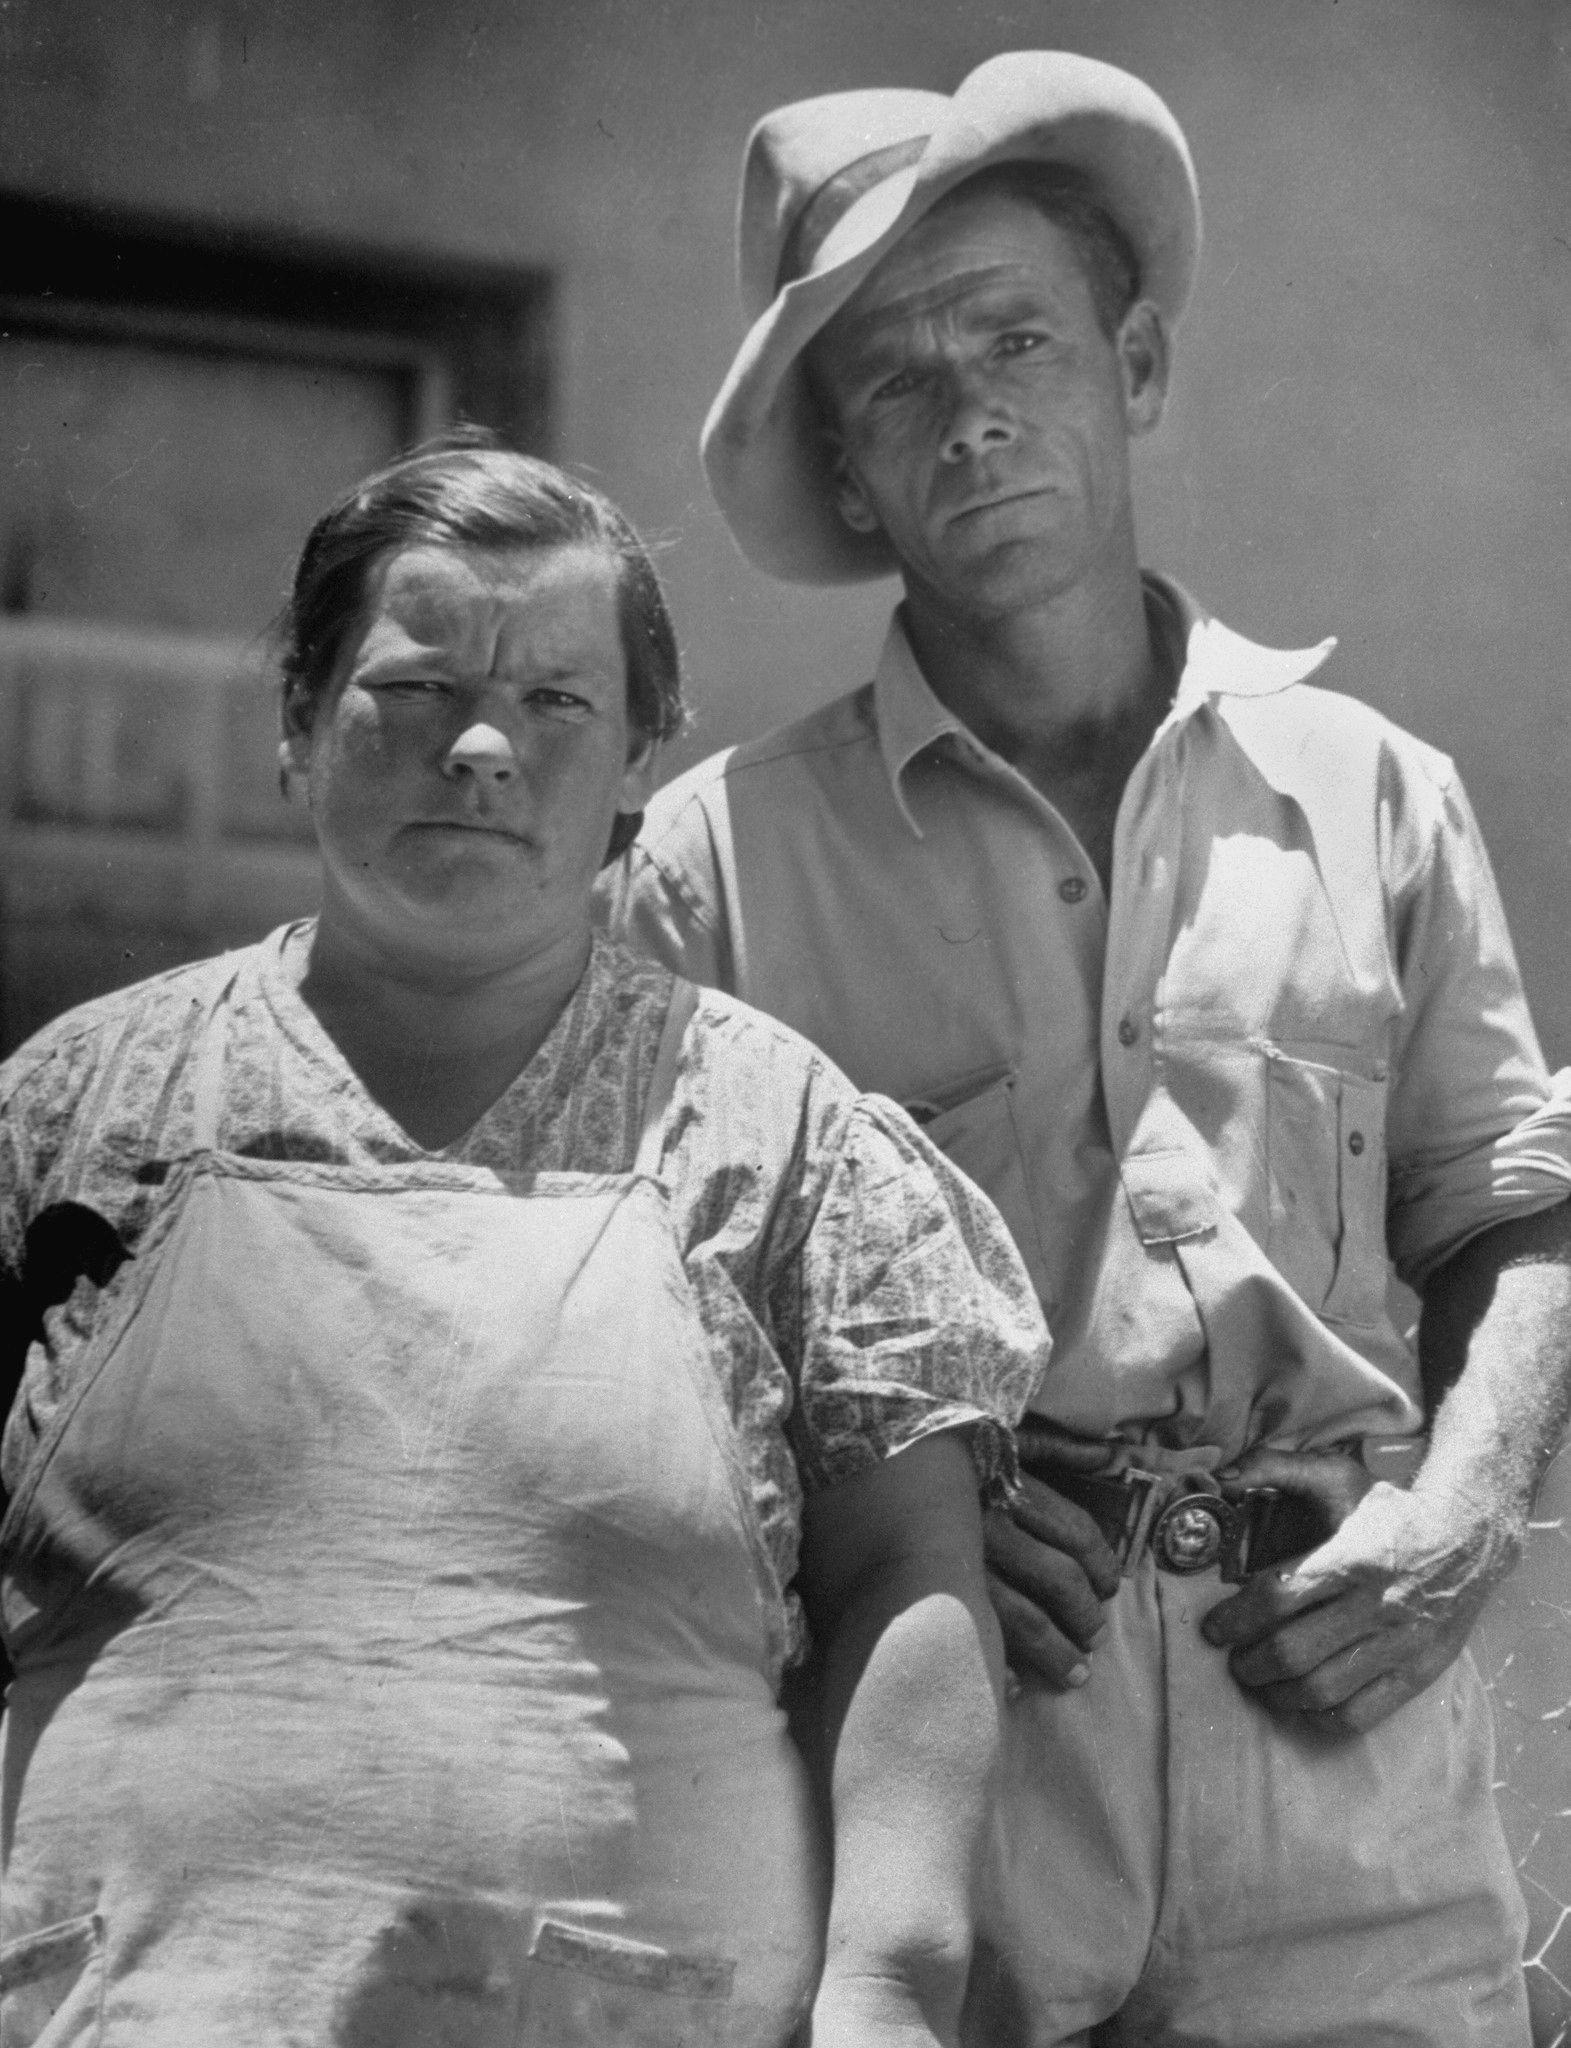 A painter observes a farmers wife